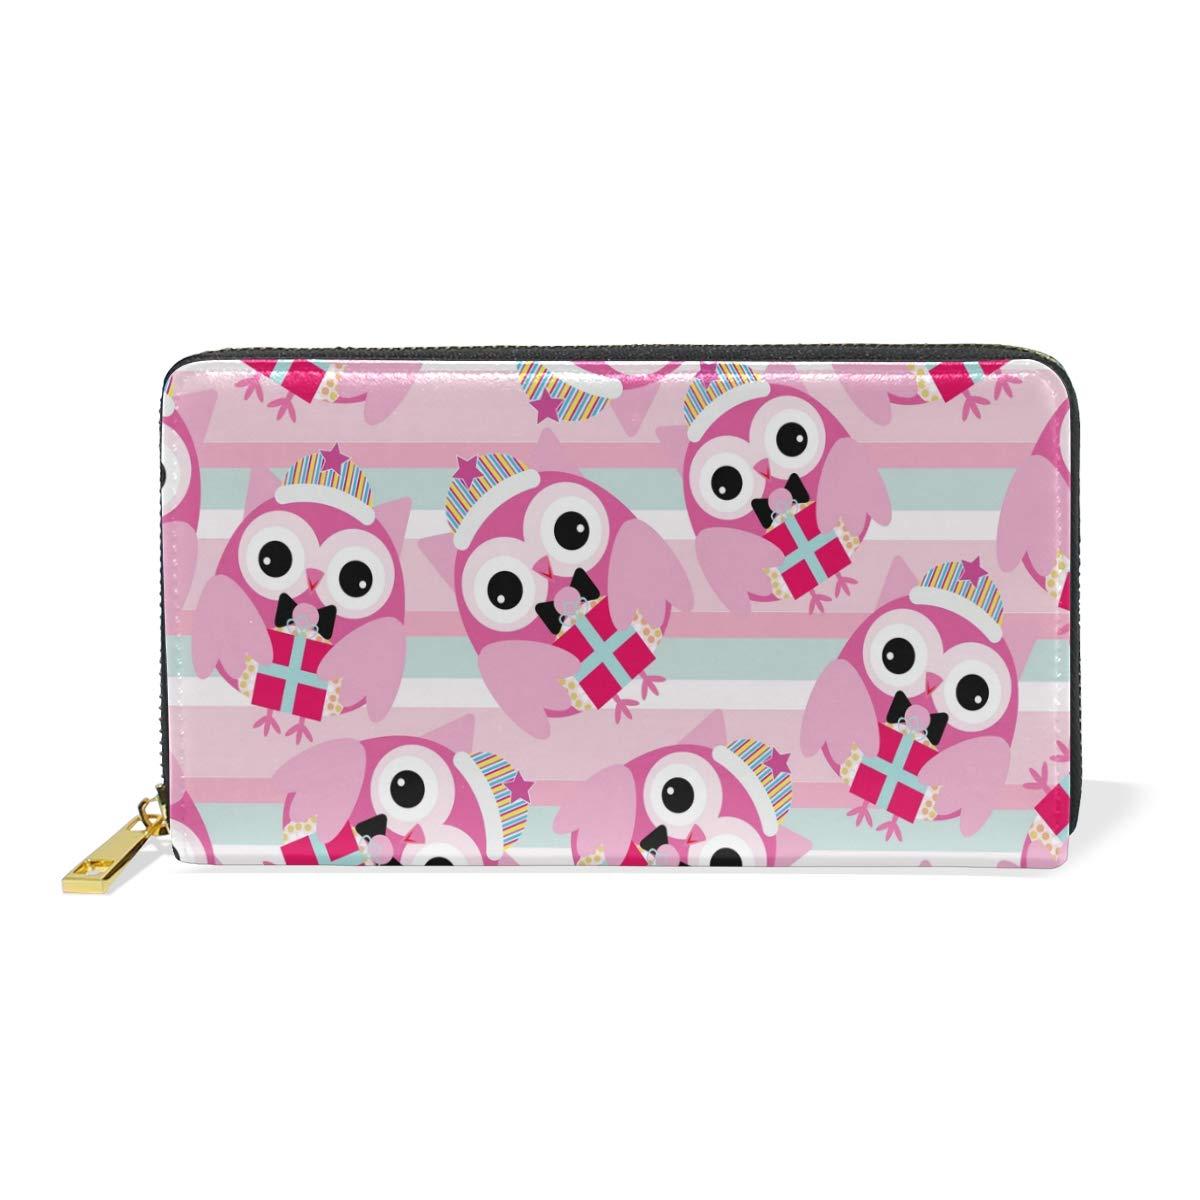 Women Genuine Leather Wallet Pink Owls Zipper Purse Girl Phone Clutch